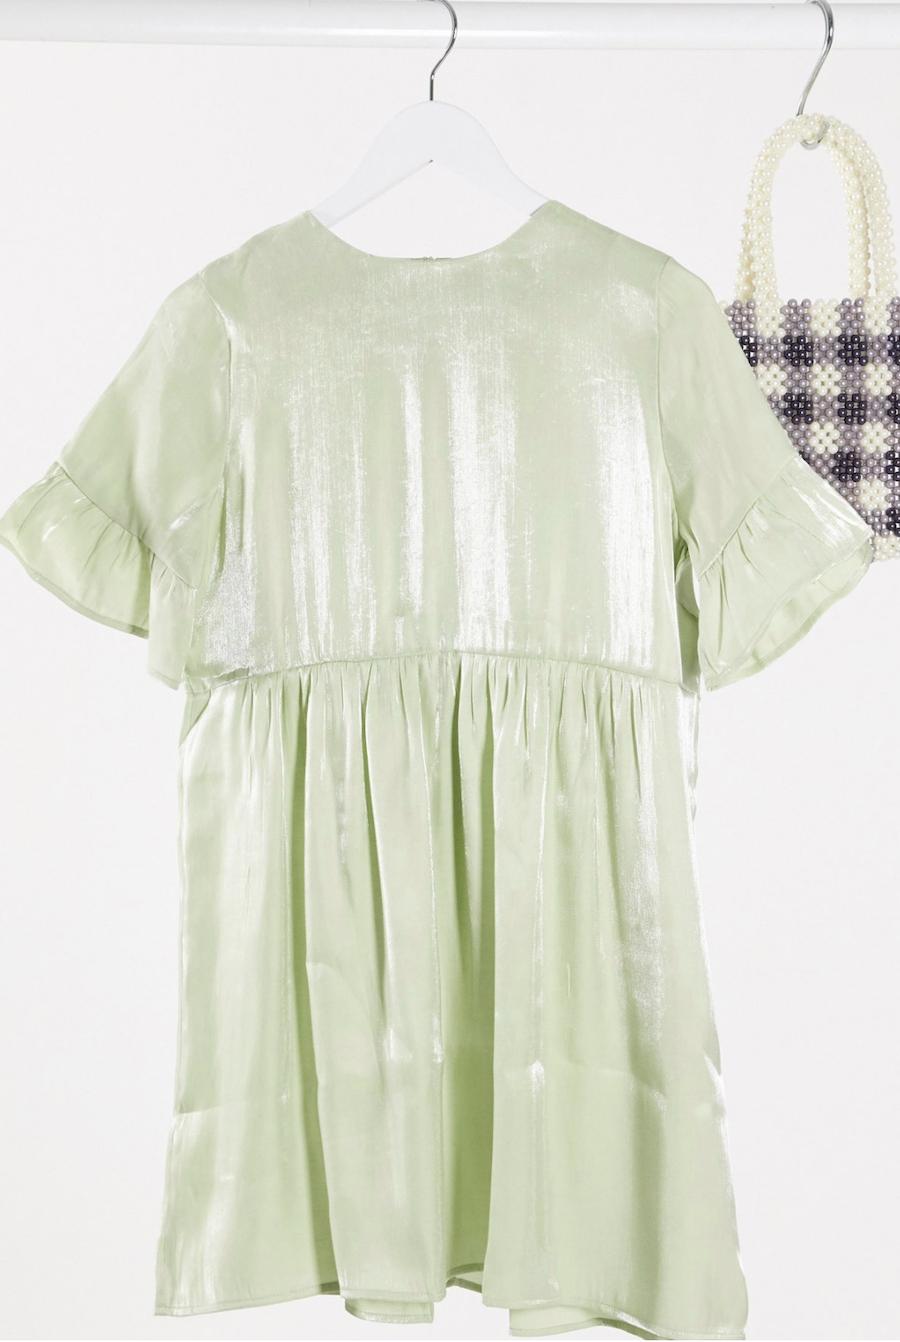 Lola May's wide dress